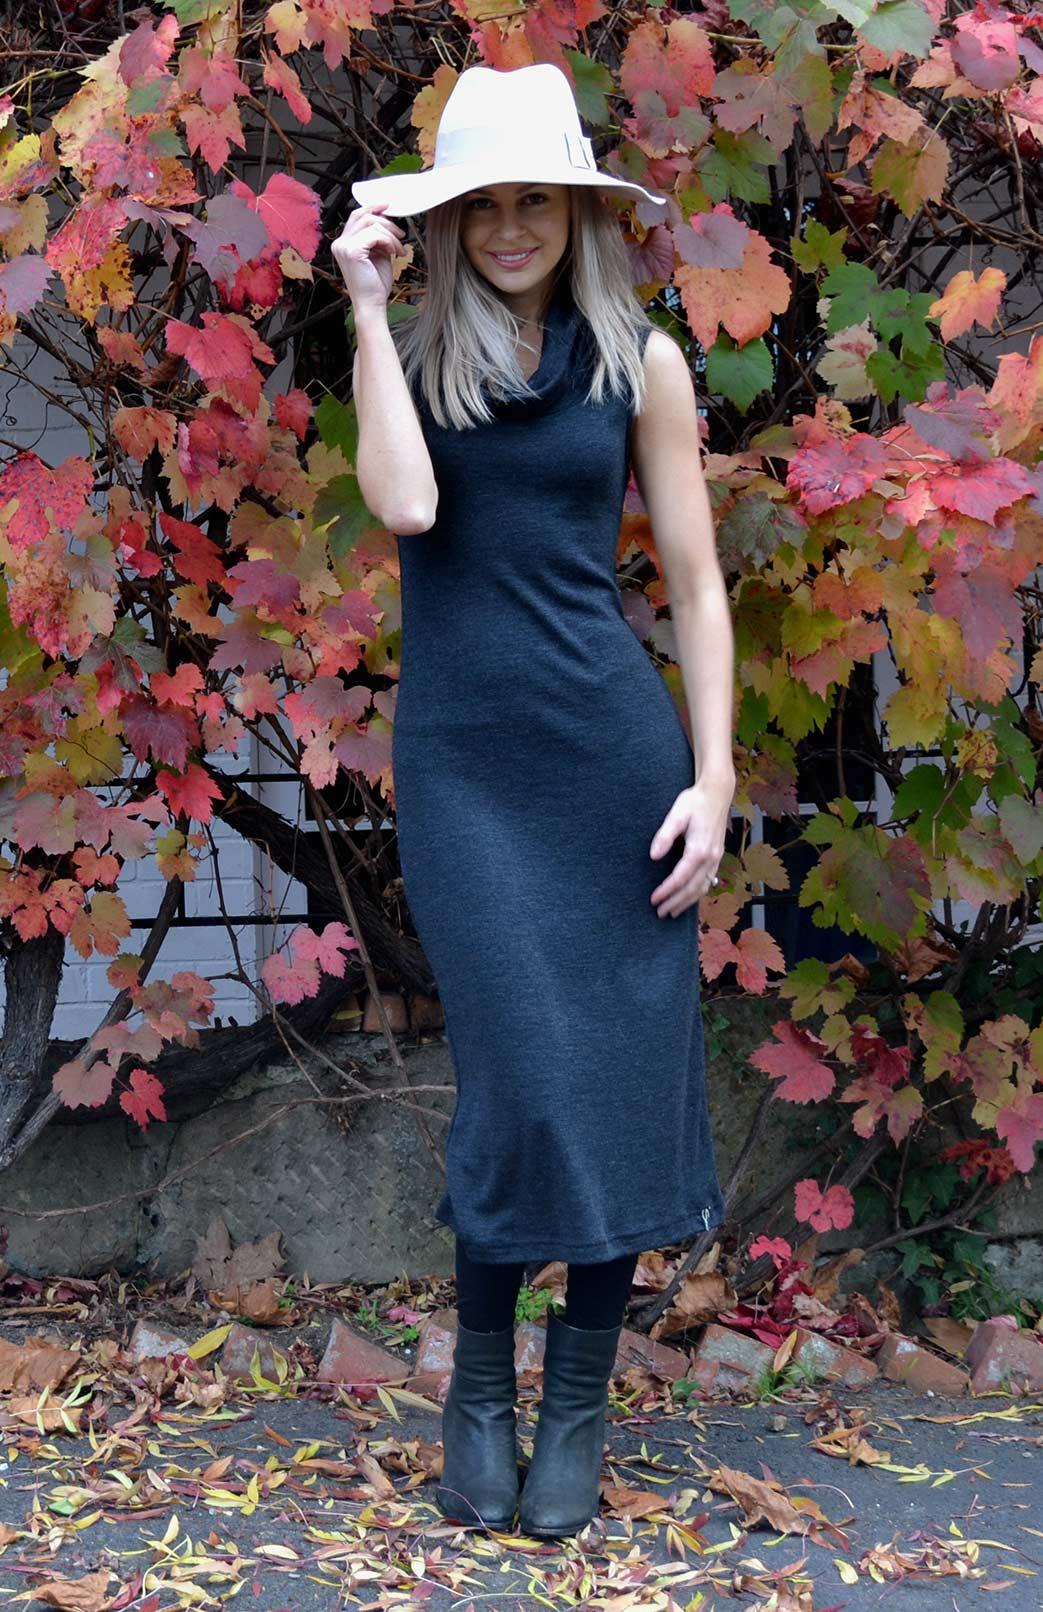 Cowl Neck Midi Dress - Women's Dark Charcoal Grey Sleeveless Heavyweight Merino Cowl Neck Midi Dress for Winter - Smitten Merino Tasmania Australia